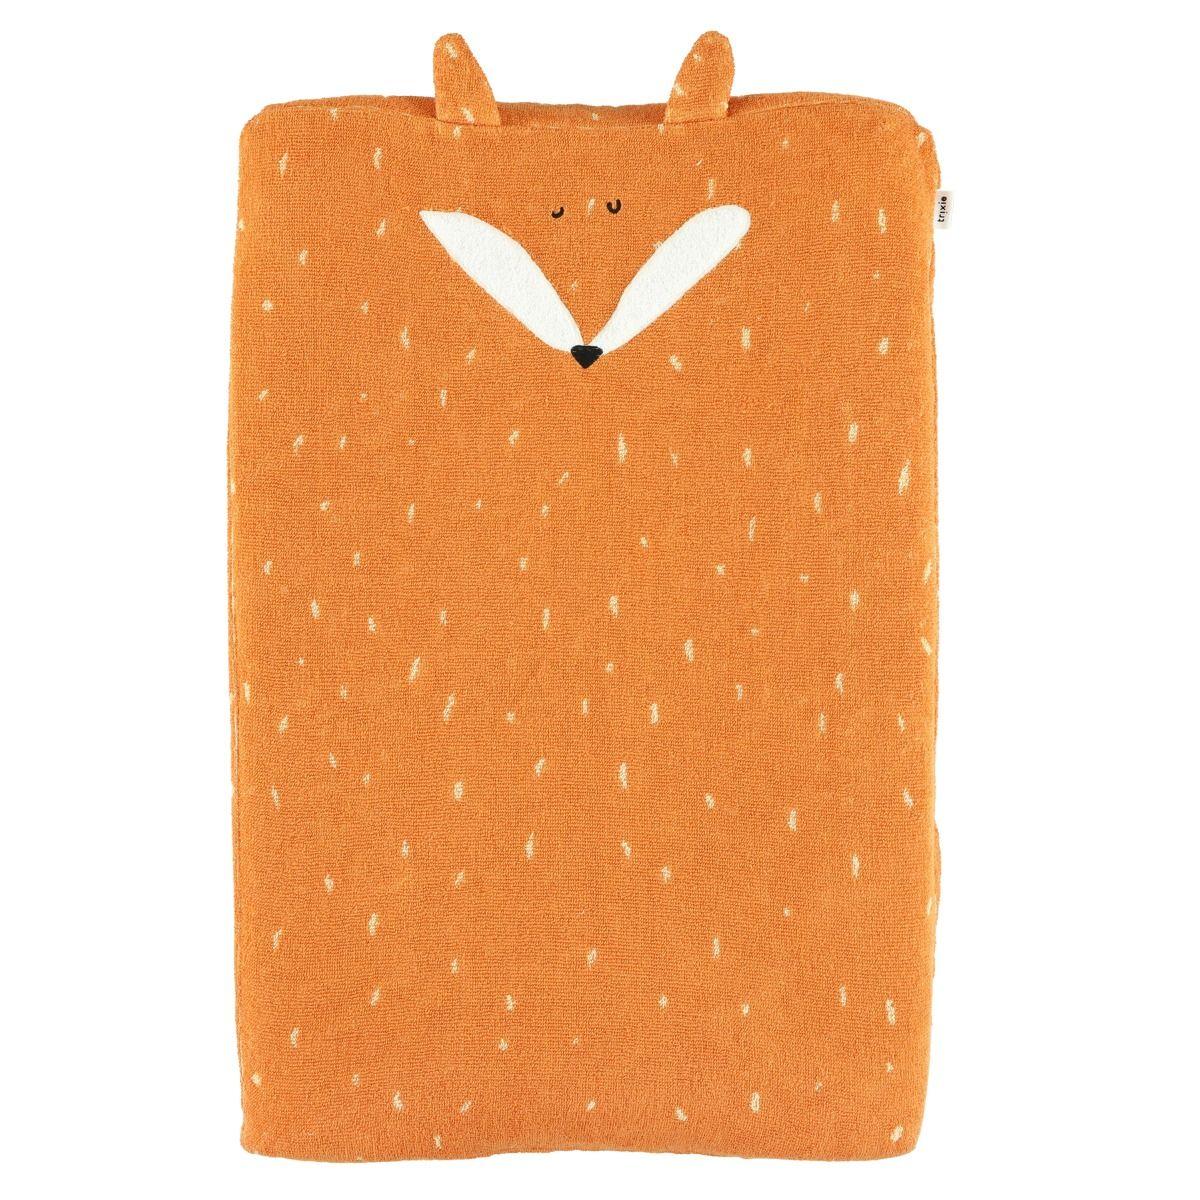 Trixie Aankleedkussenhoes 70x45cm Vos - Mr. Fox